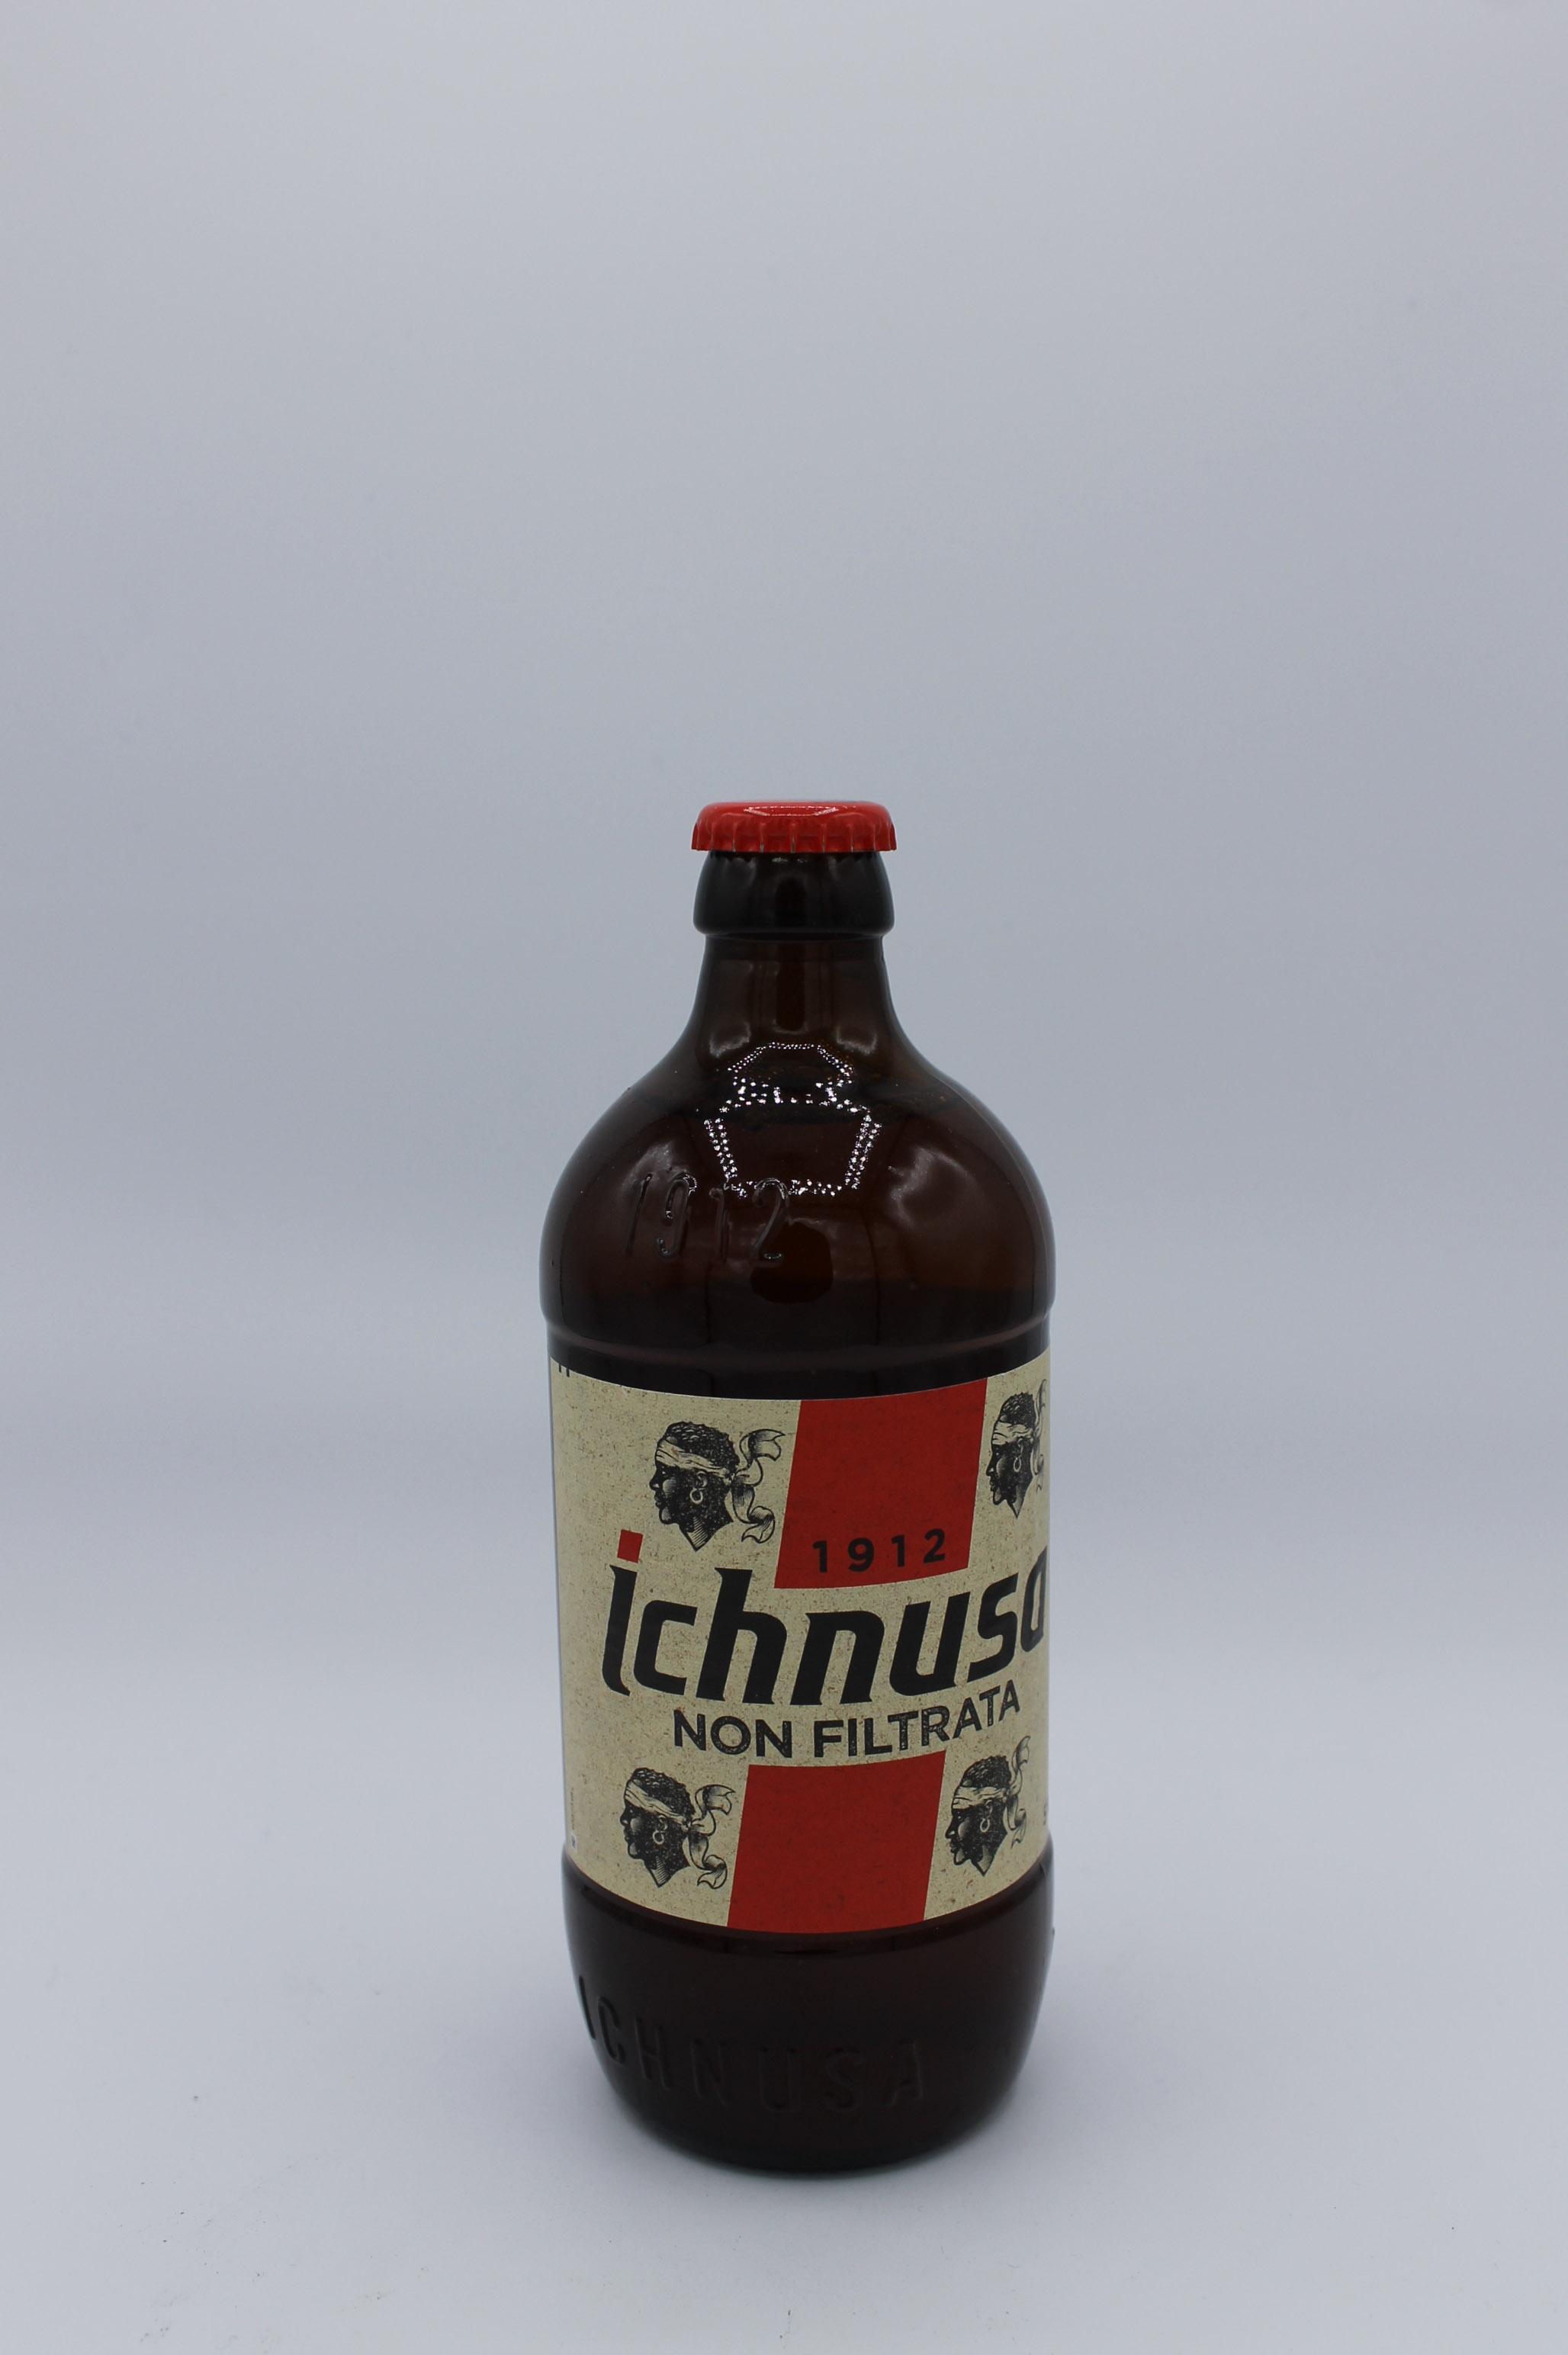 Ichnusa birra non filtrata 500ml.